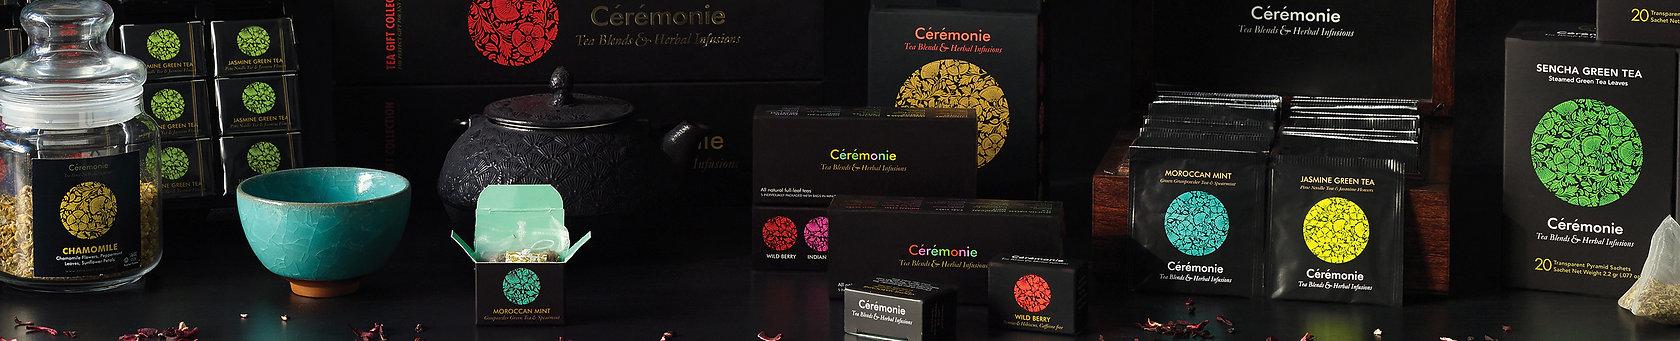 Panorama Ceremonie Tea products